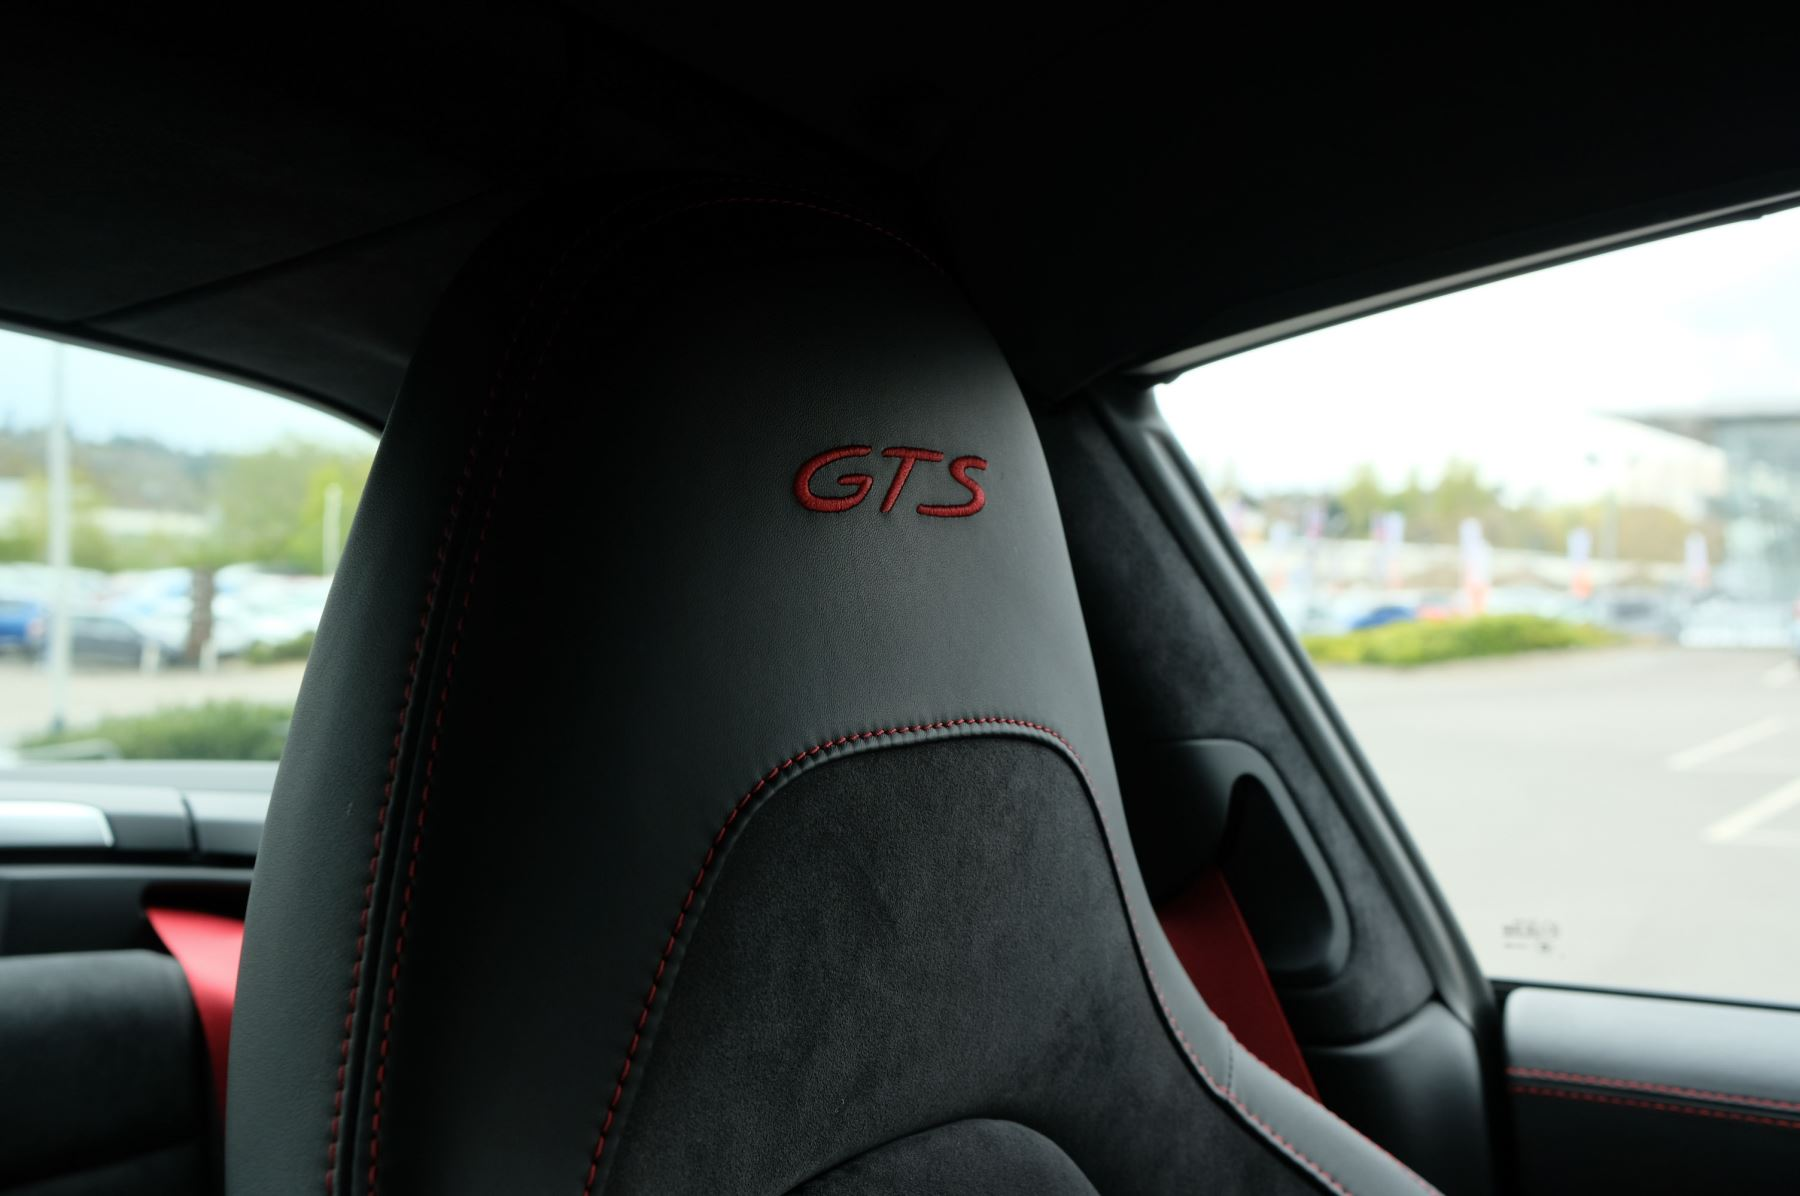 Porsche 911 TARGA 4 GTS - PDK - SPORT DESIGN PACKAGE - GTS INTERIOR PACKAGE image 35